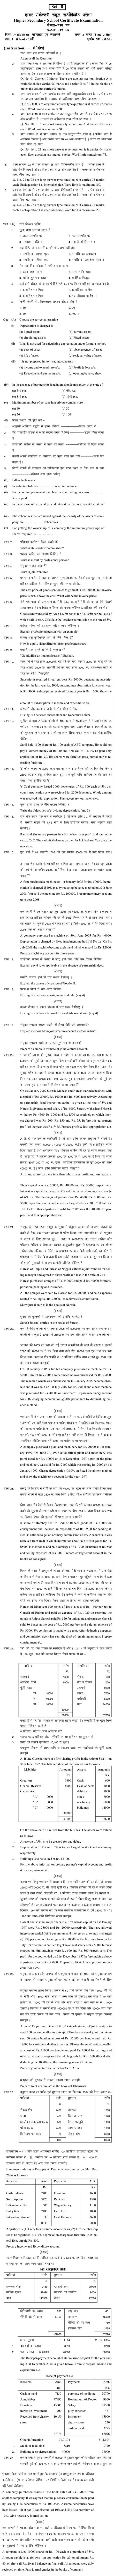 Chattisgarh Board Class 12 Pustapalan evam lekhakarmaSample Paper